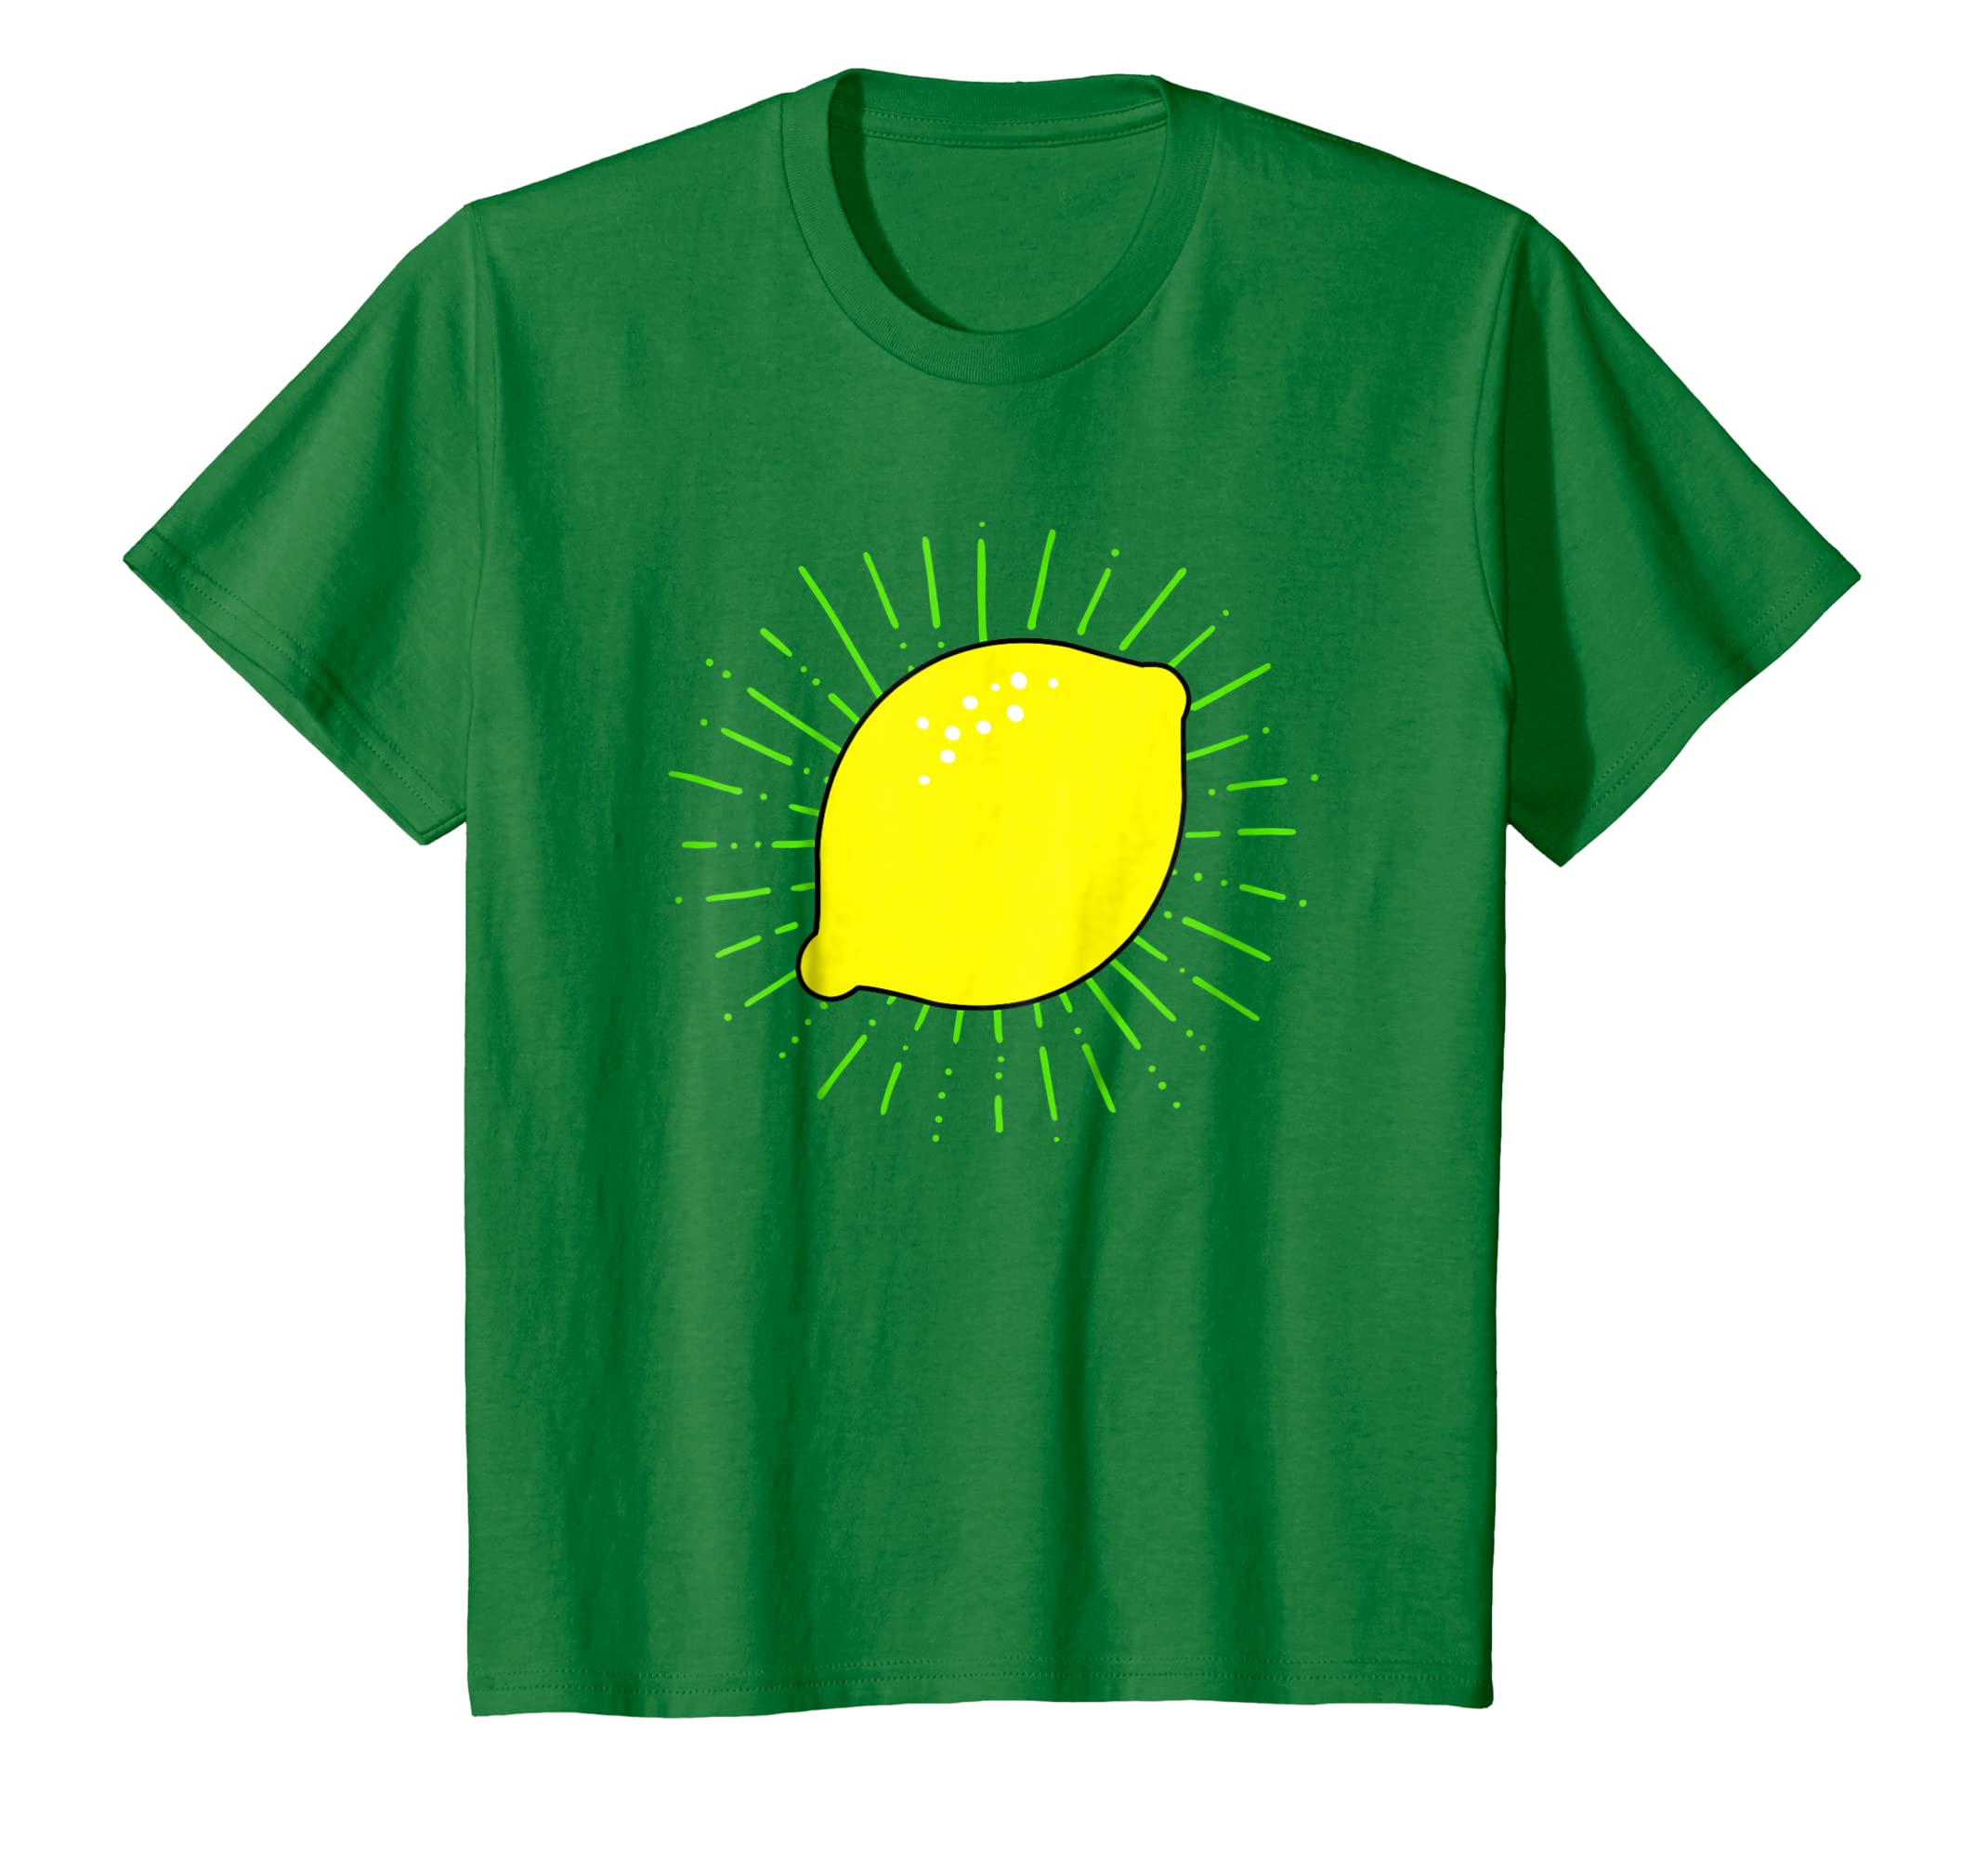 b76bd592ef6 Amazon.com: Lemon Print Shirt on White, Yellow, Green & Blue T Shirt:  Clothing